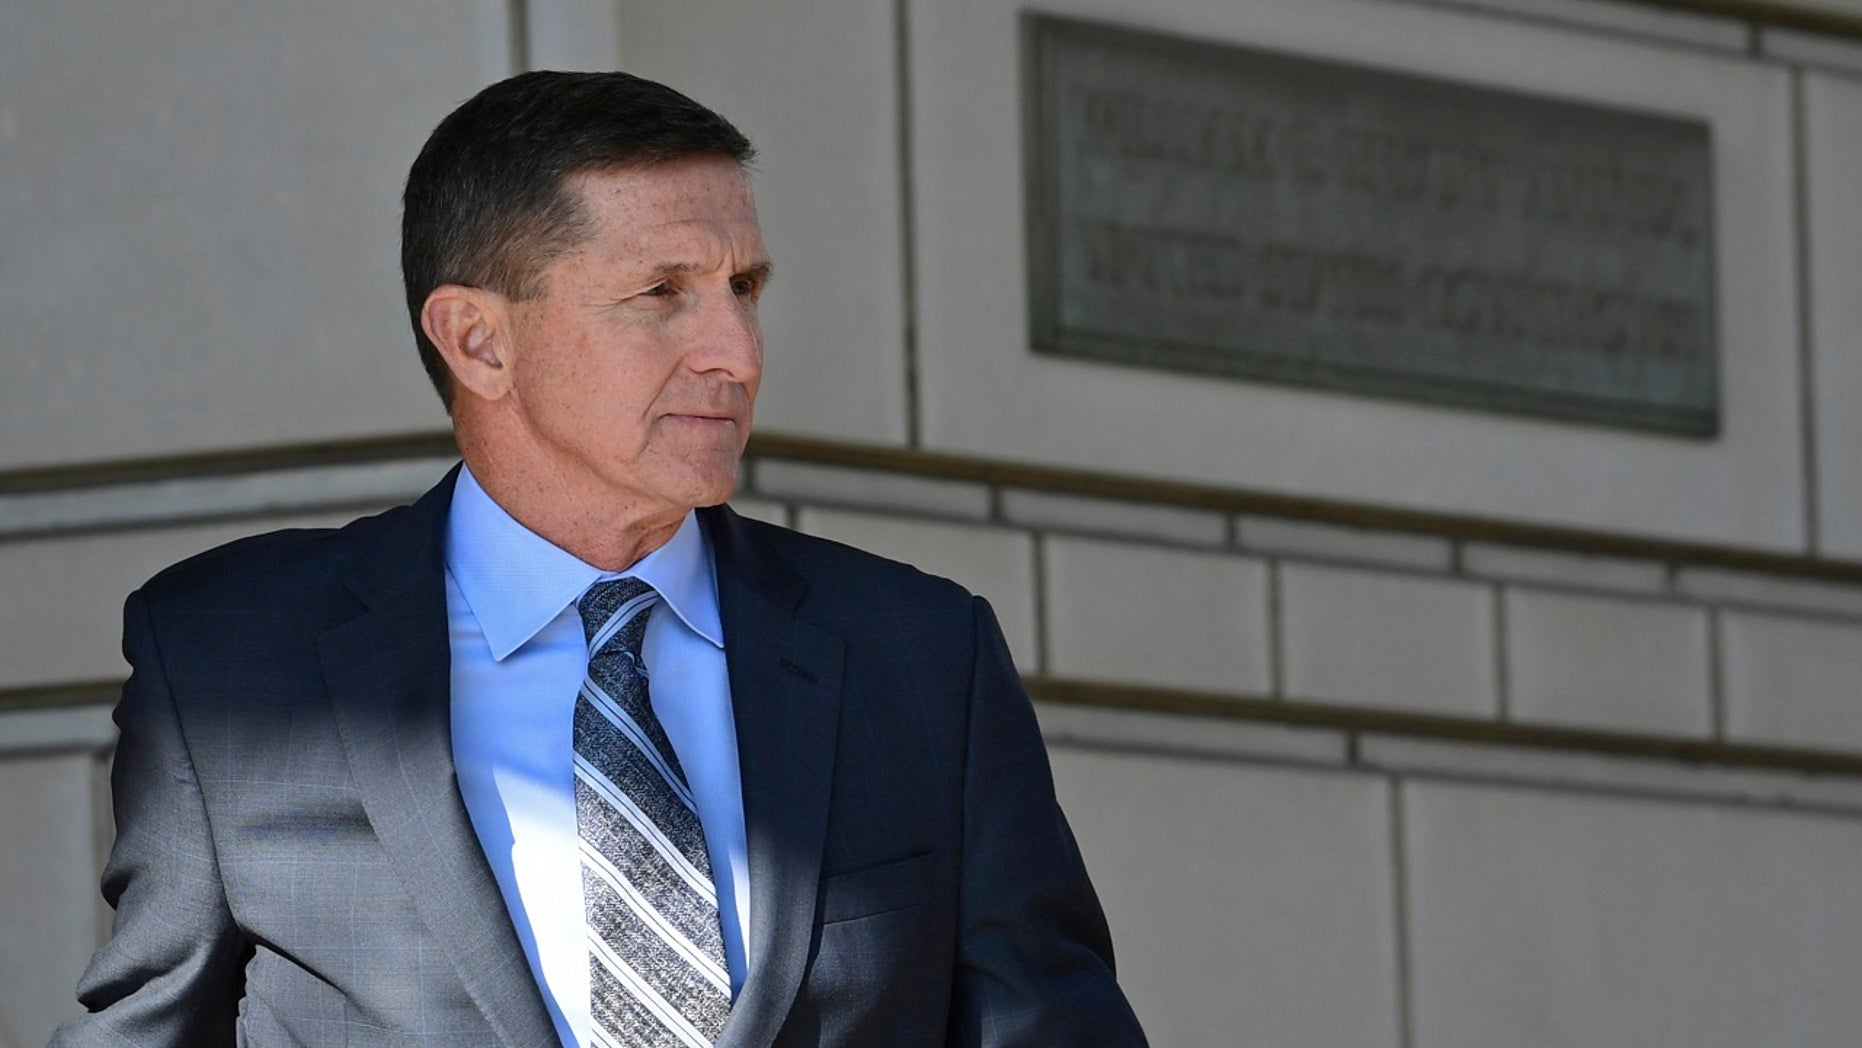 Former Trump national security adviser Michael Flynn leaves federal court in Washington, Dec. 1, 2017.